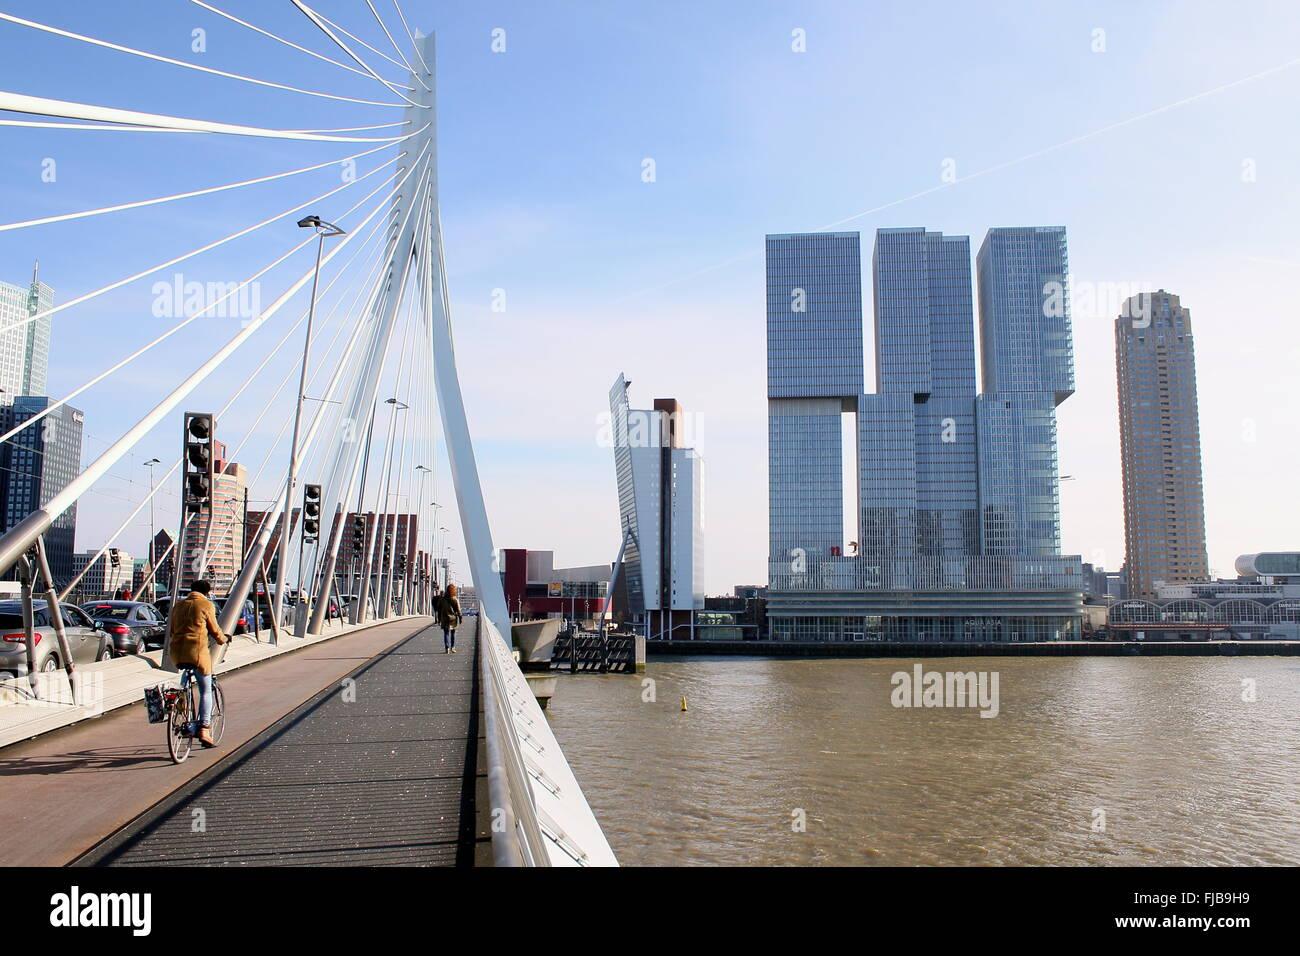 Erasmus bridge view on 'De Rotterdam' skyscraper (2013, Rem Koolhaas), flanked by Toren op Zuid (KPN tower) - Stock Image